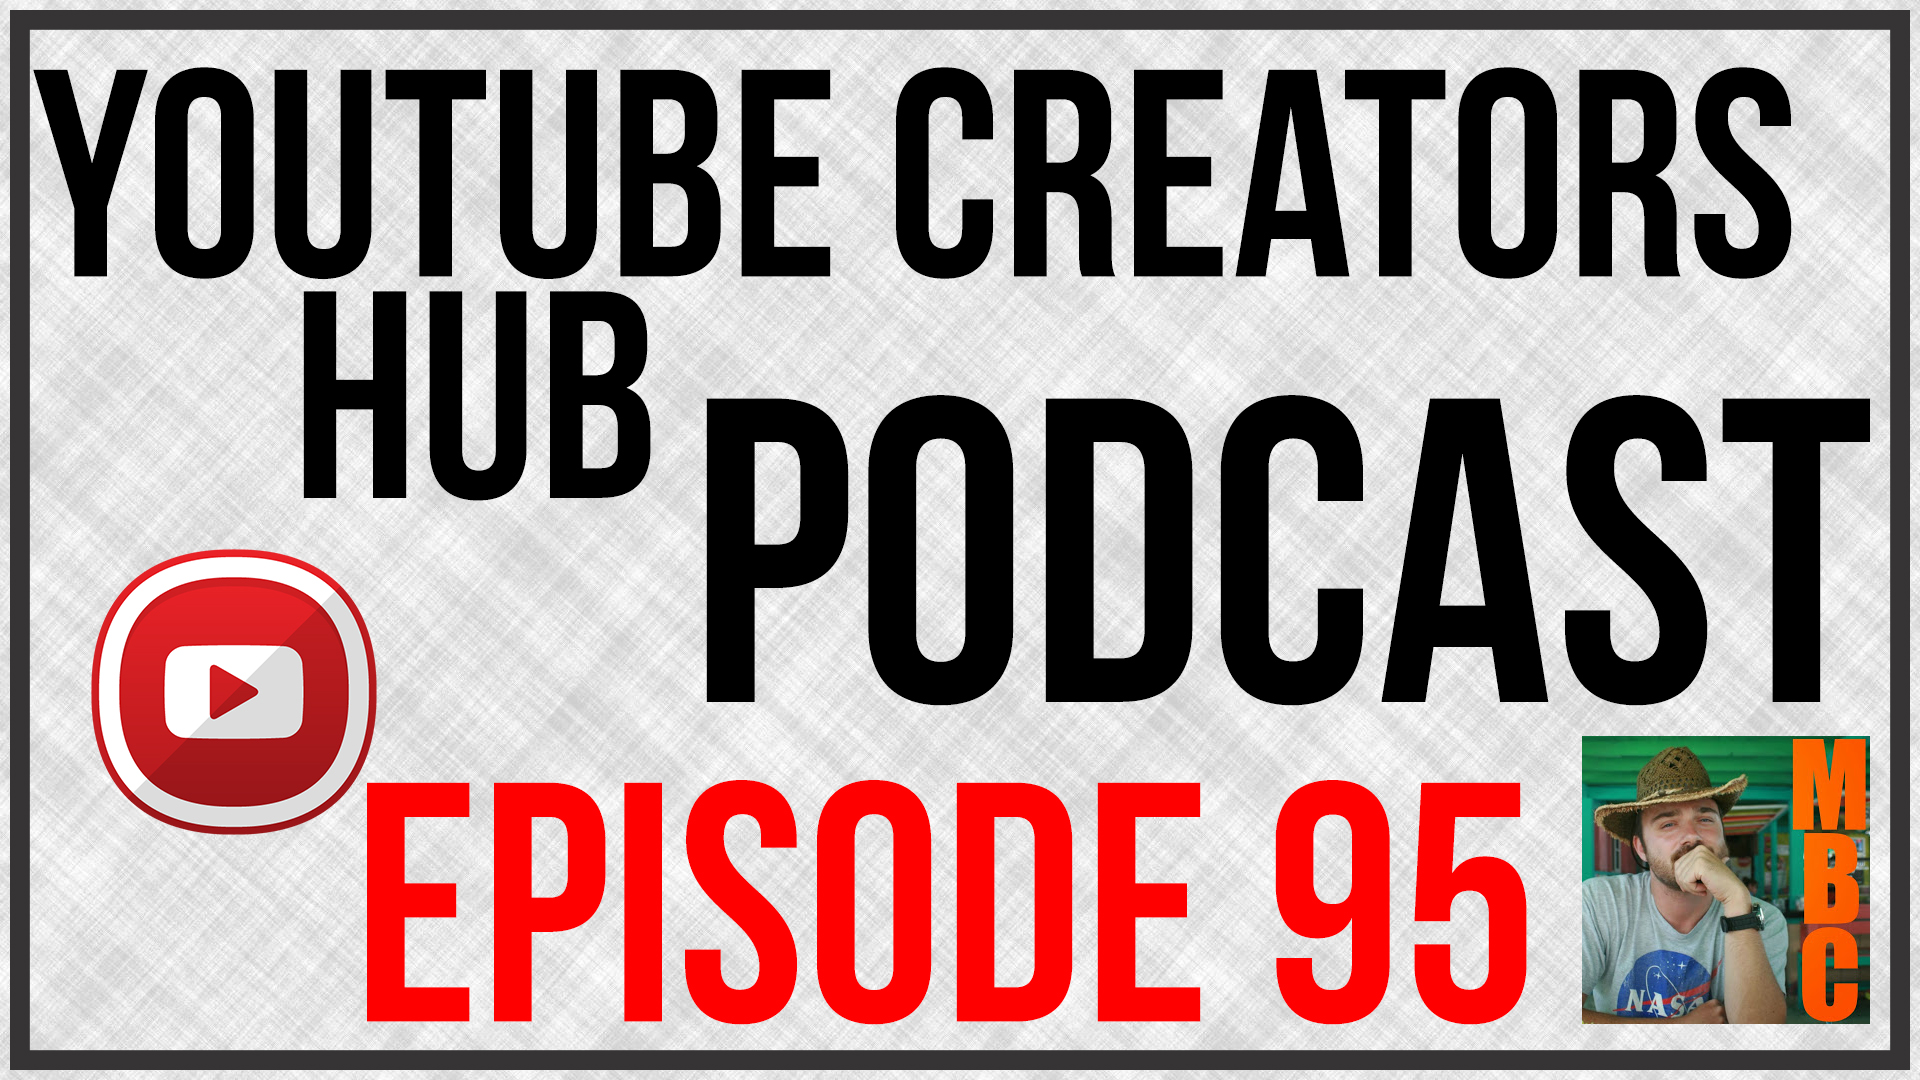 YouTube Creators Hub Podcast Episode 95